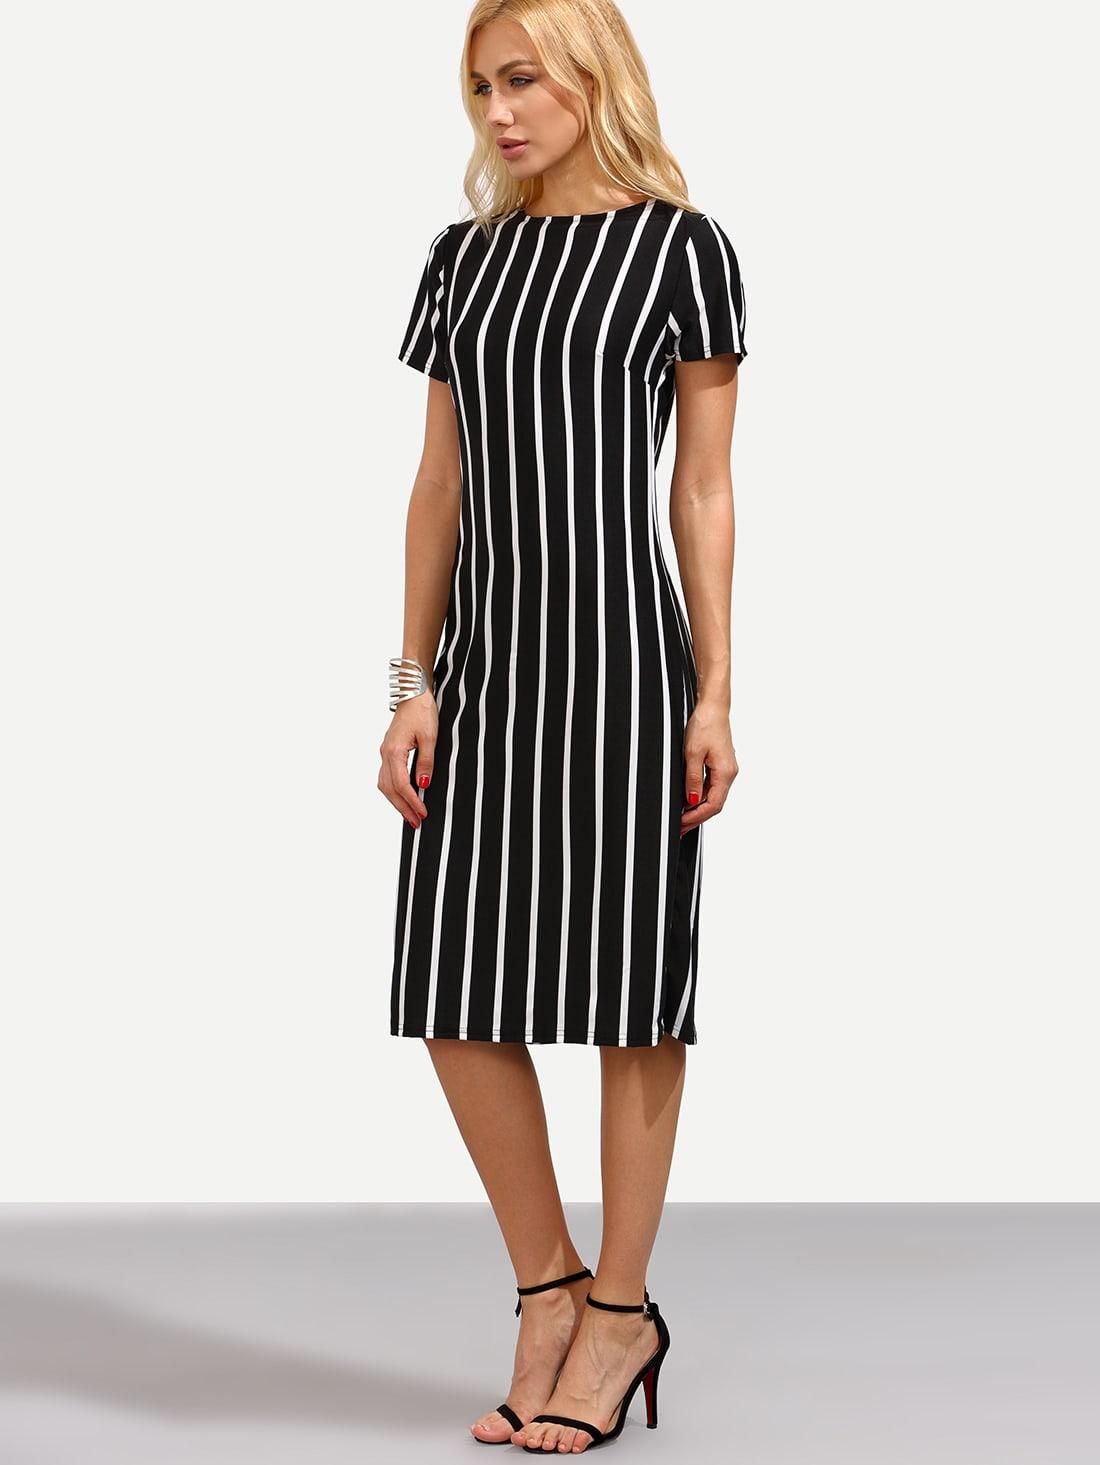 Fashion Dresses Style: Black Vertical Striped Sheath DressFor Women-romwe